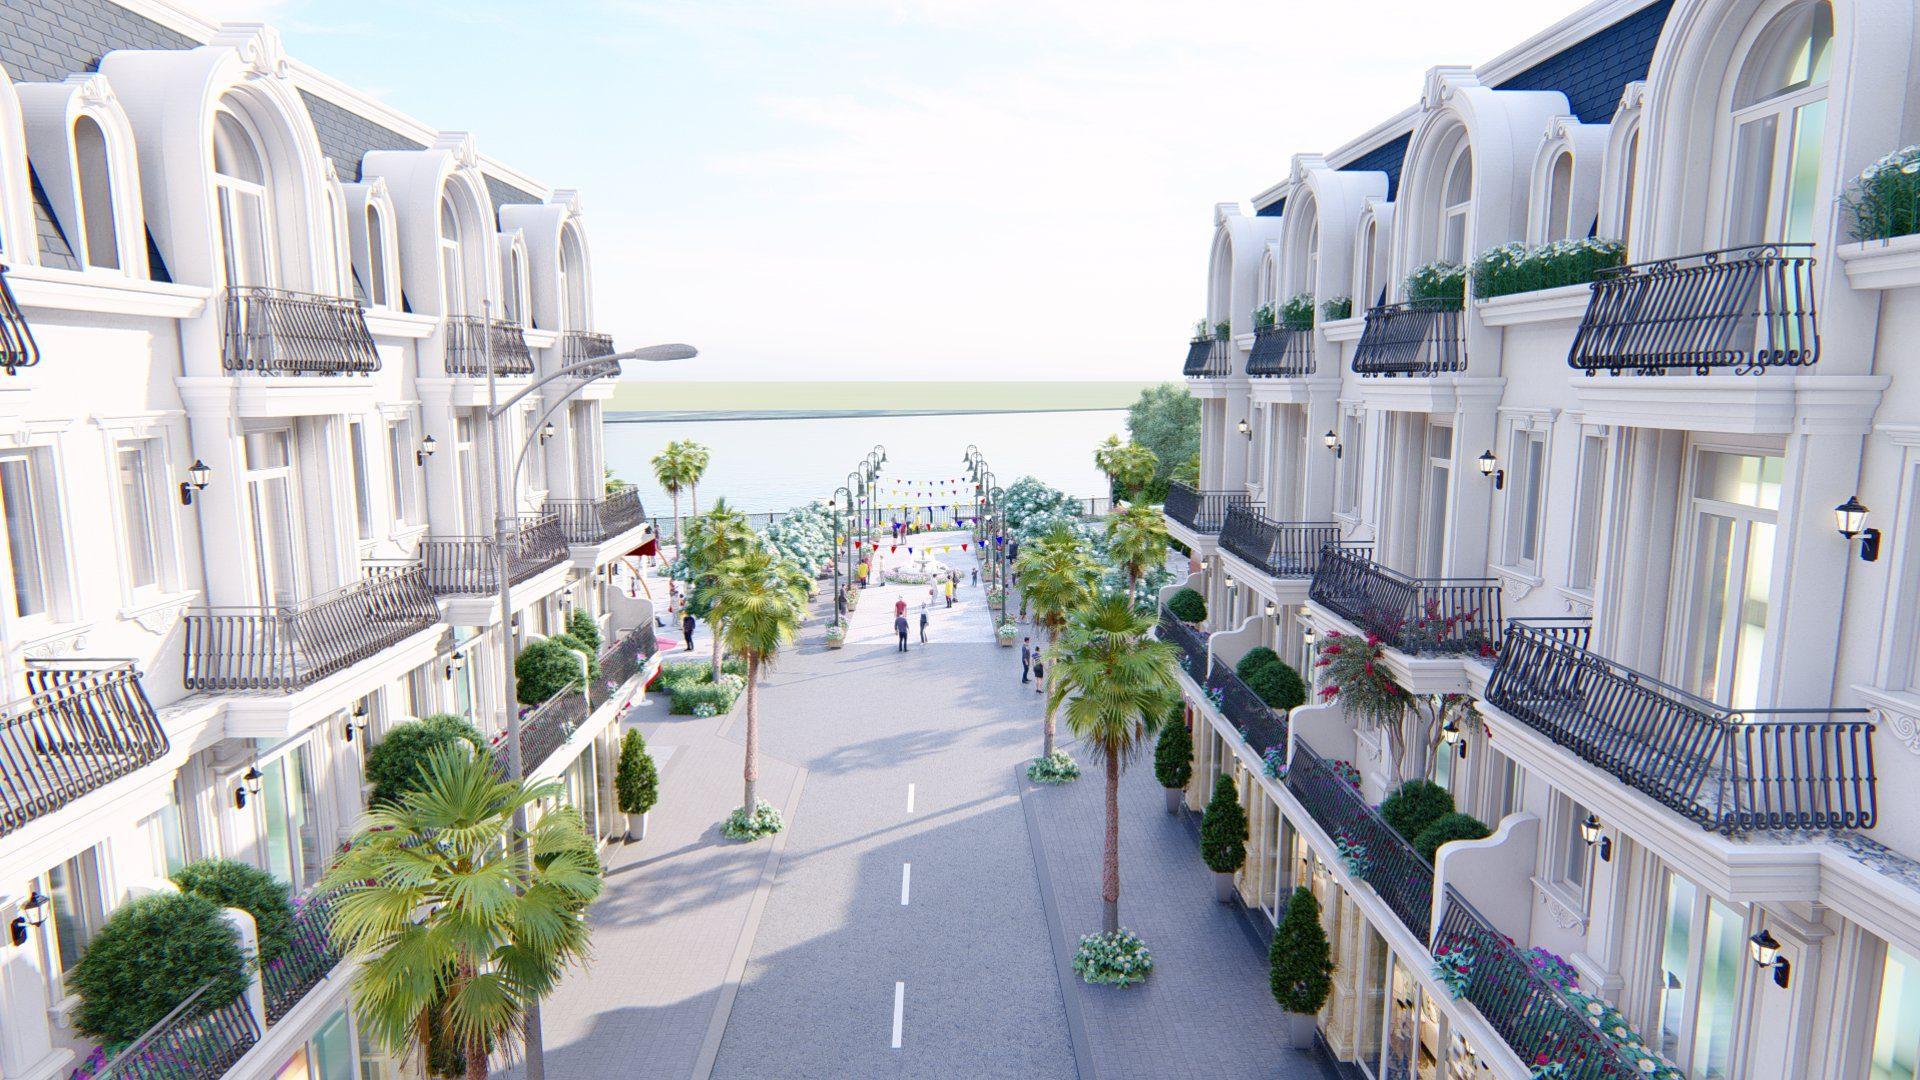 Nha Pho Nguyen Xien Tps Land